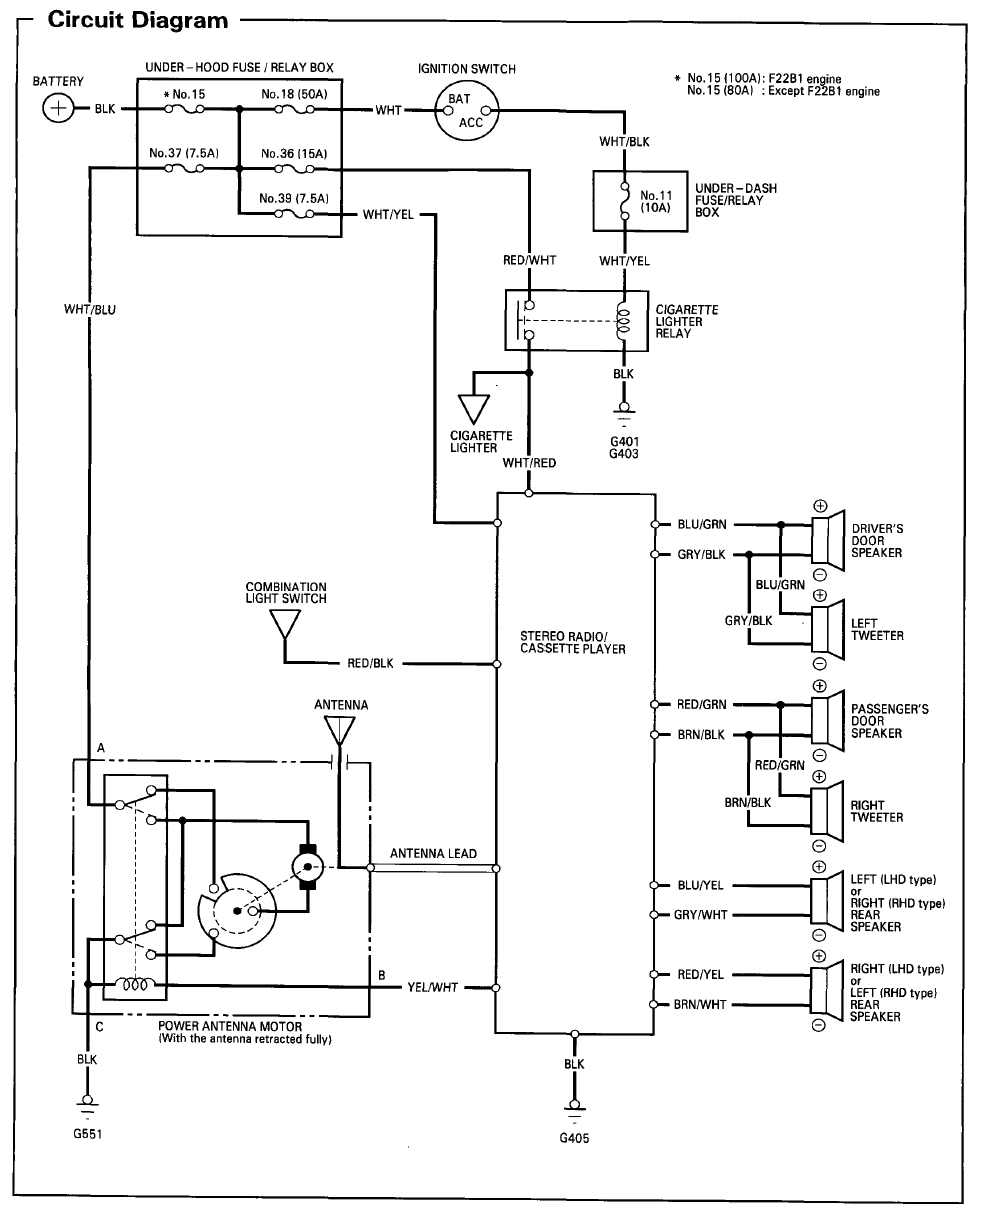 80 screenshot_2015_05_25_12_36_35_1_62aa79c55f9532458bb6b000cc627fd82bc11b83?resize\\\\\=665%2C815\\\\\&ssl\\\\\=1 diagrams 600261 tow hitch wiring diagram trailer wiring 2015 silverado wiring diagram at mifinder.co